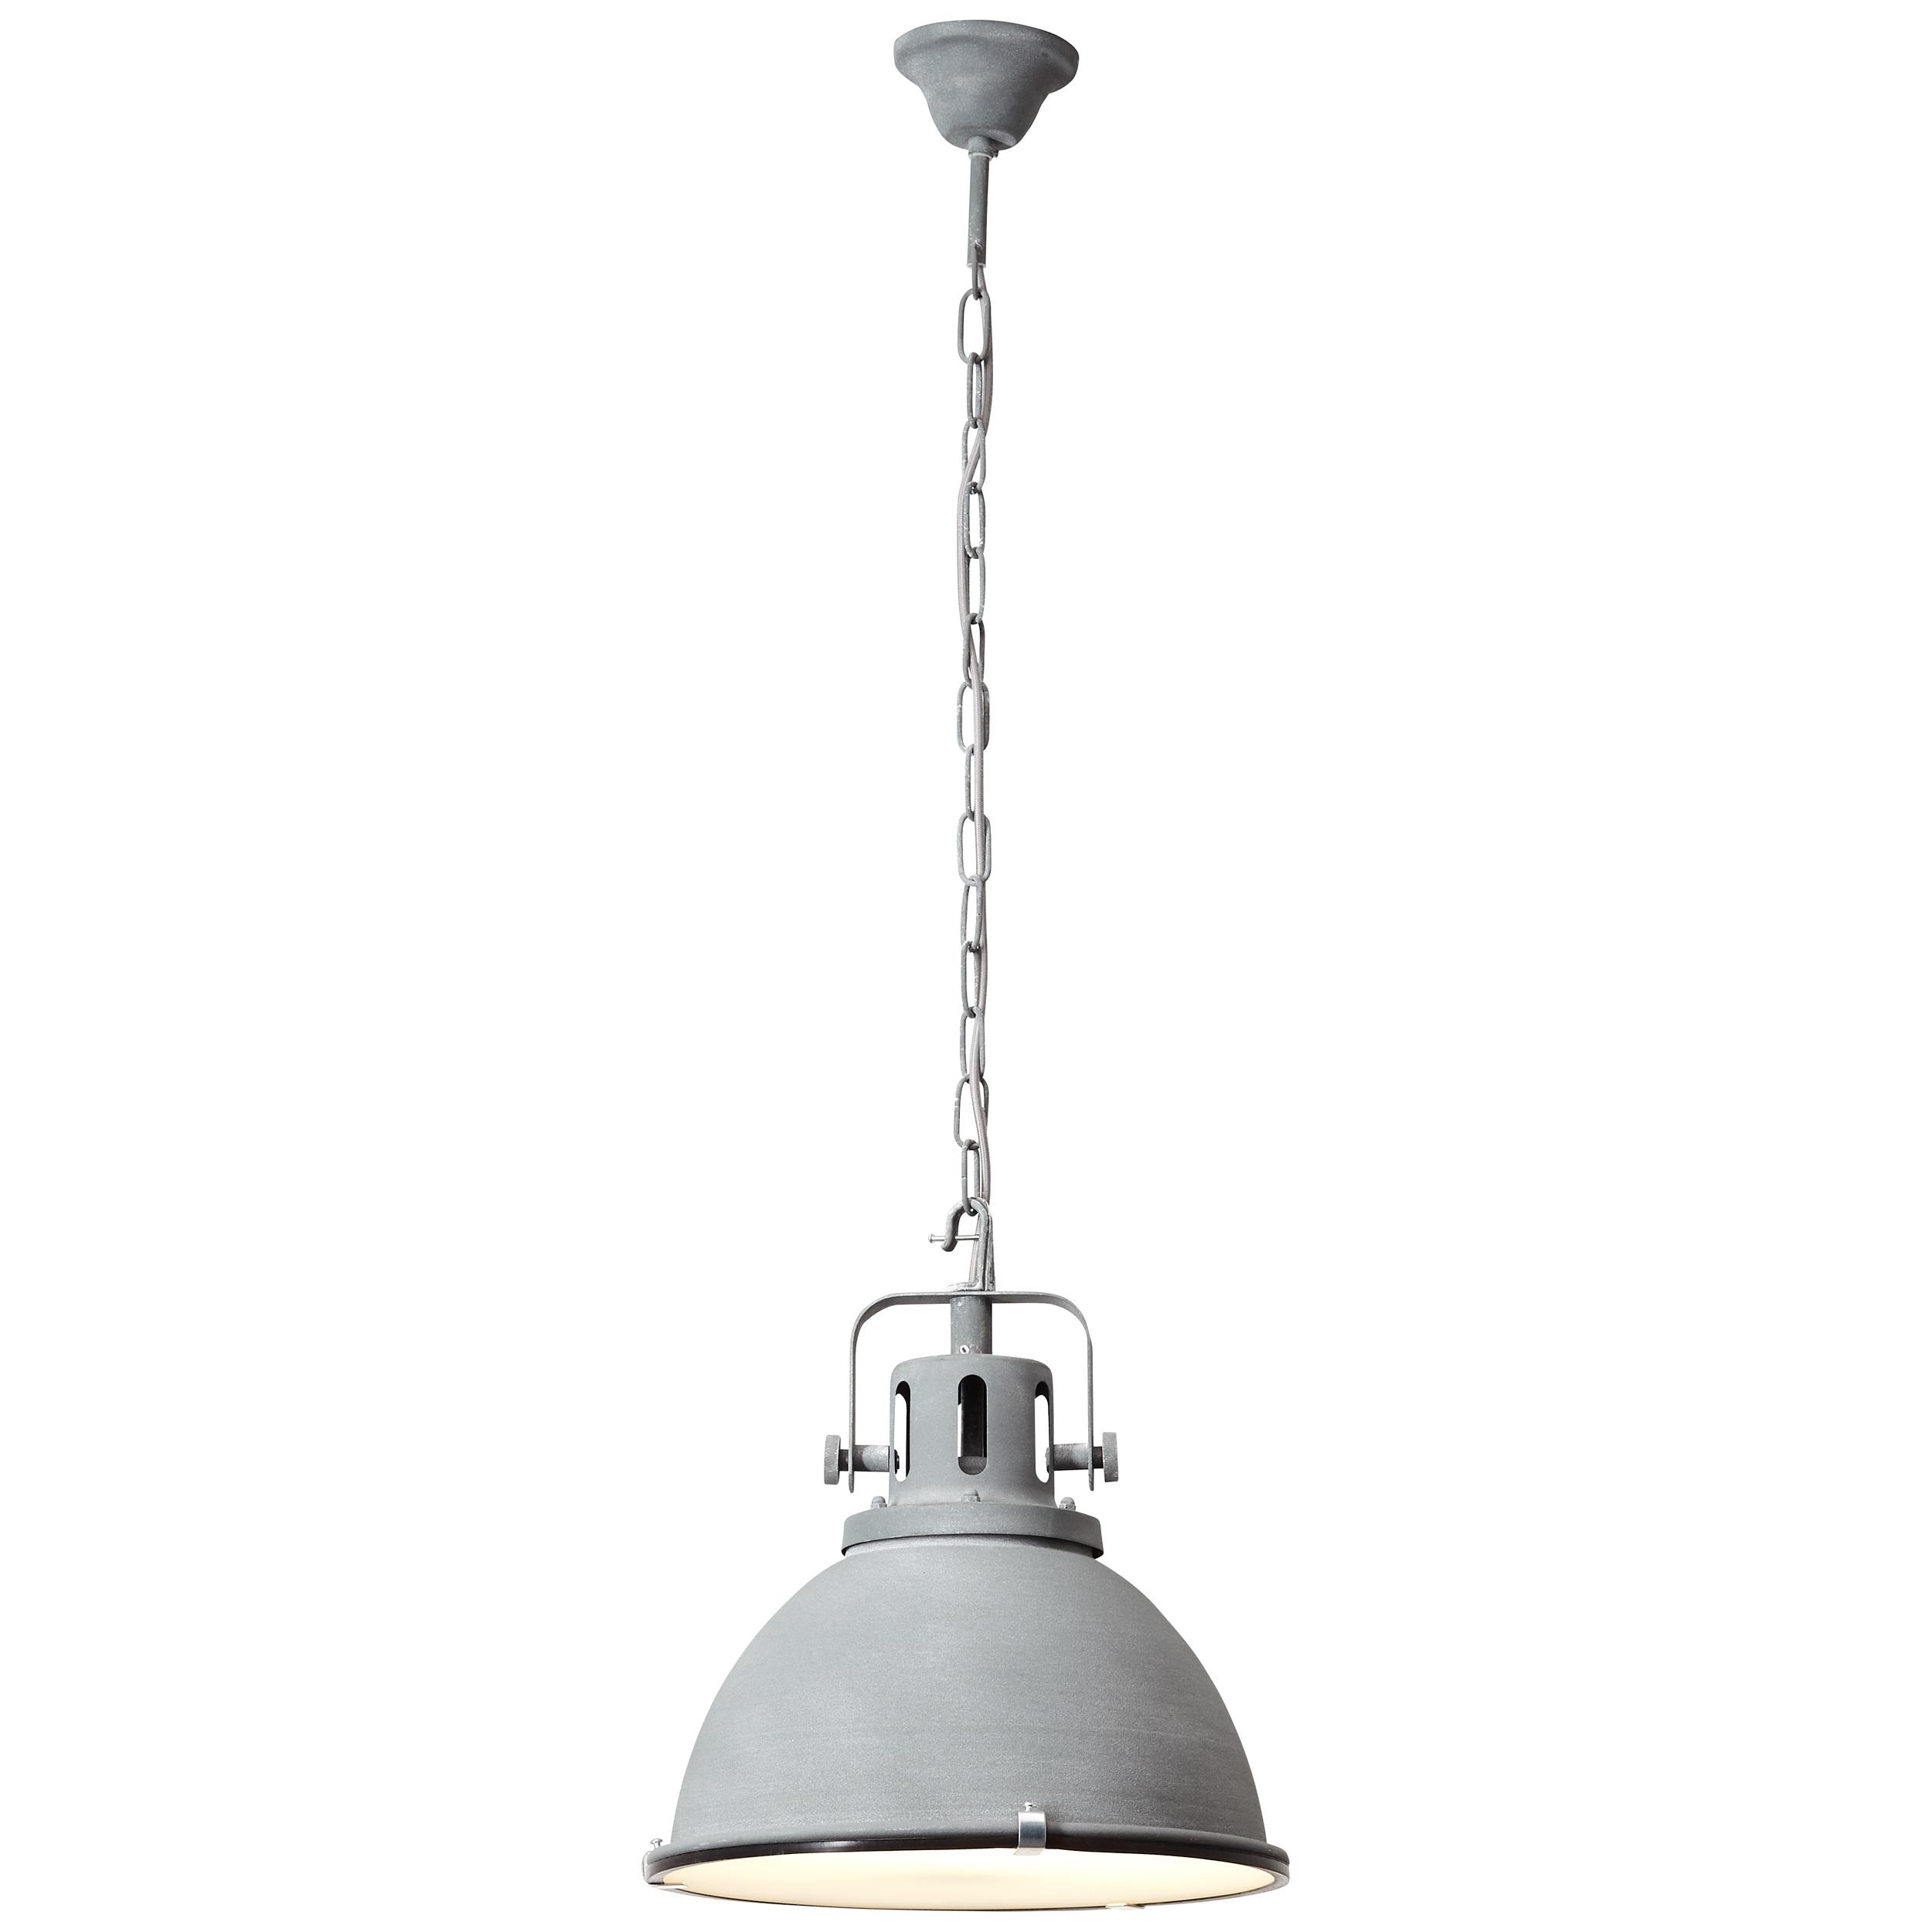 Brilliant Leuchten Jesper Pendelleuchte 38cm Glas grau Beton